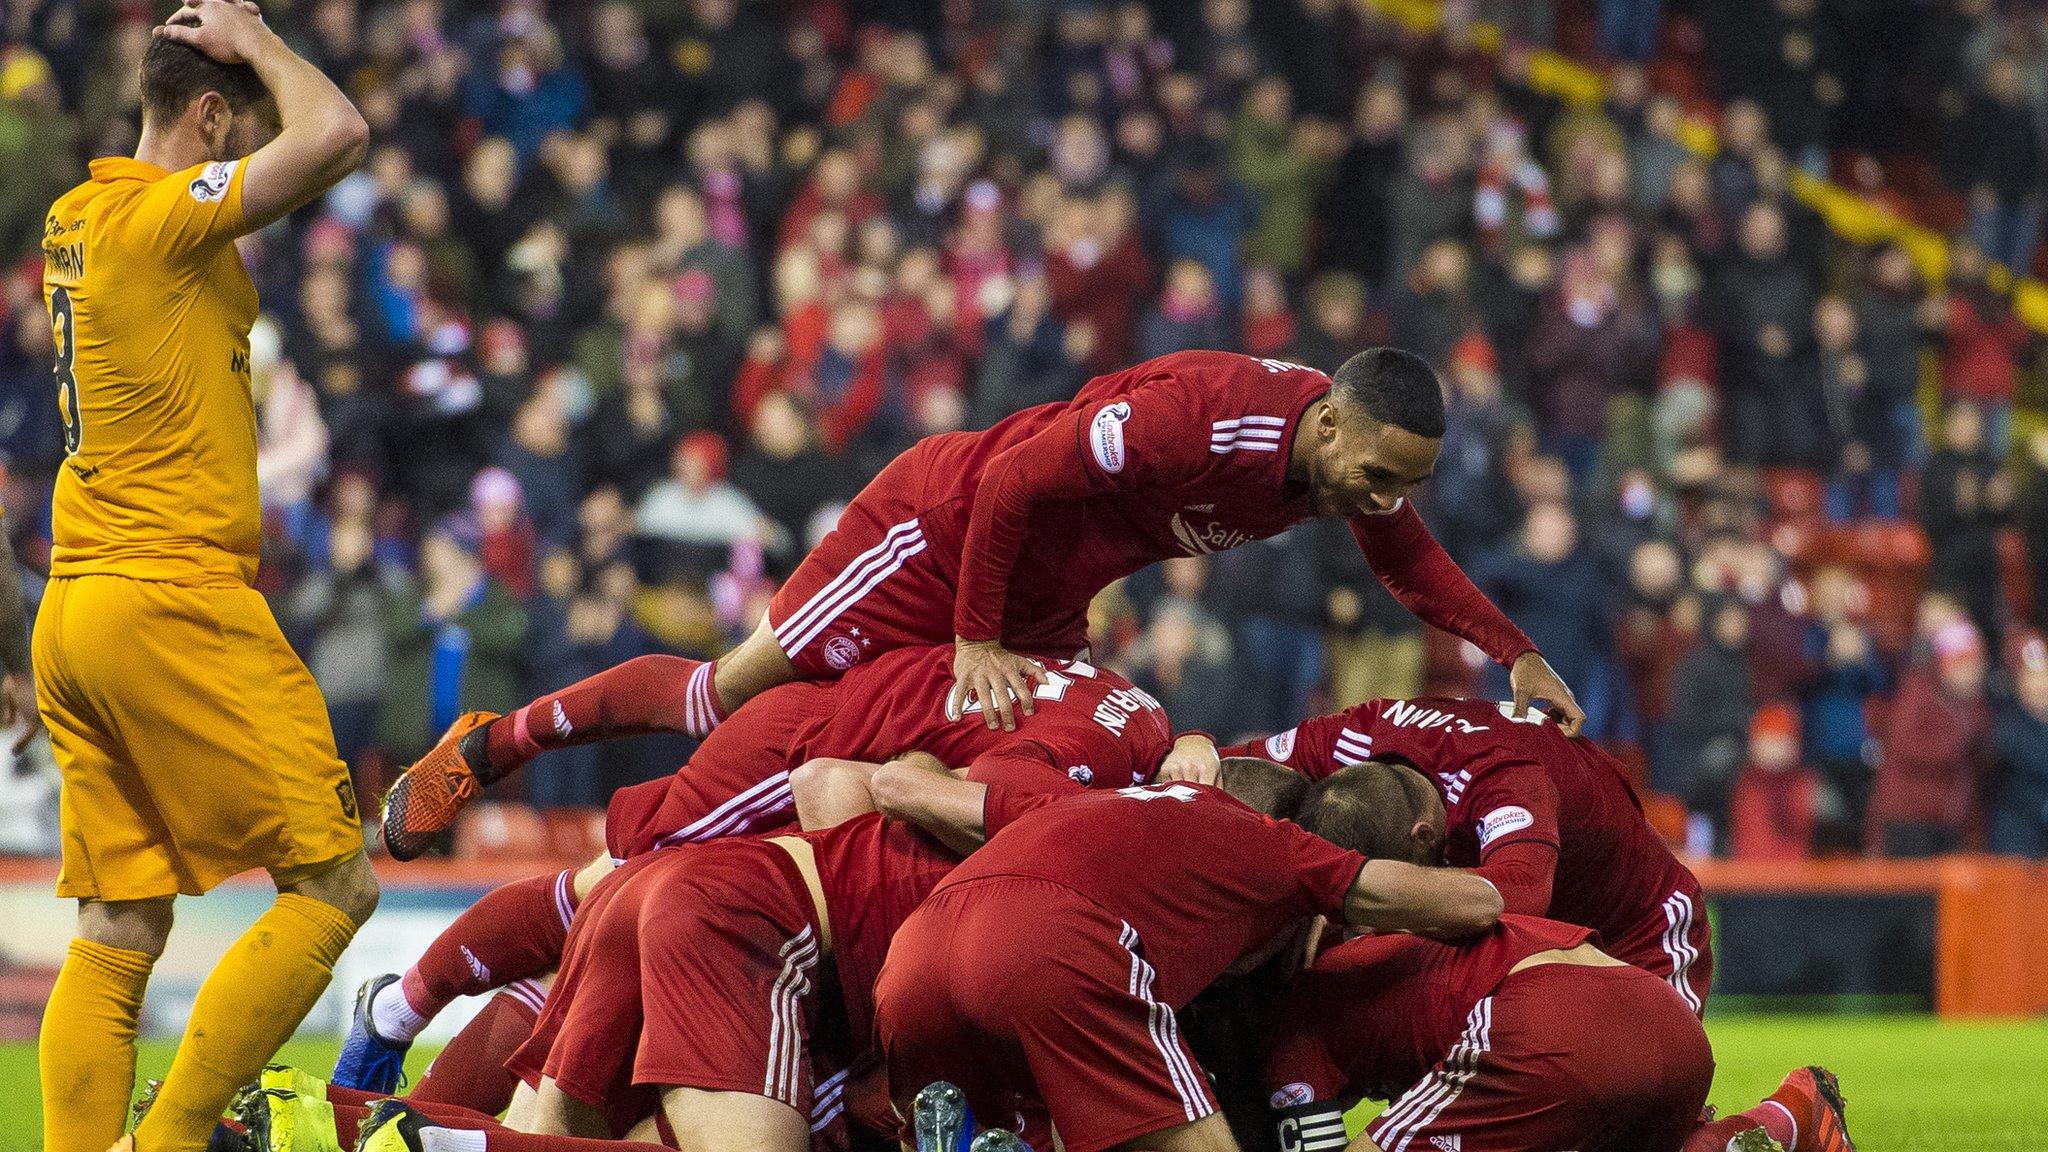 Aberdeen 3-2 Livingston: Lewis Ferguson overhead kick secures late Dons victory